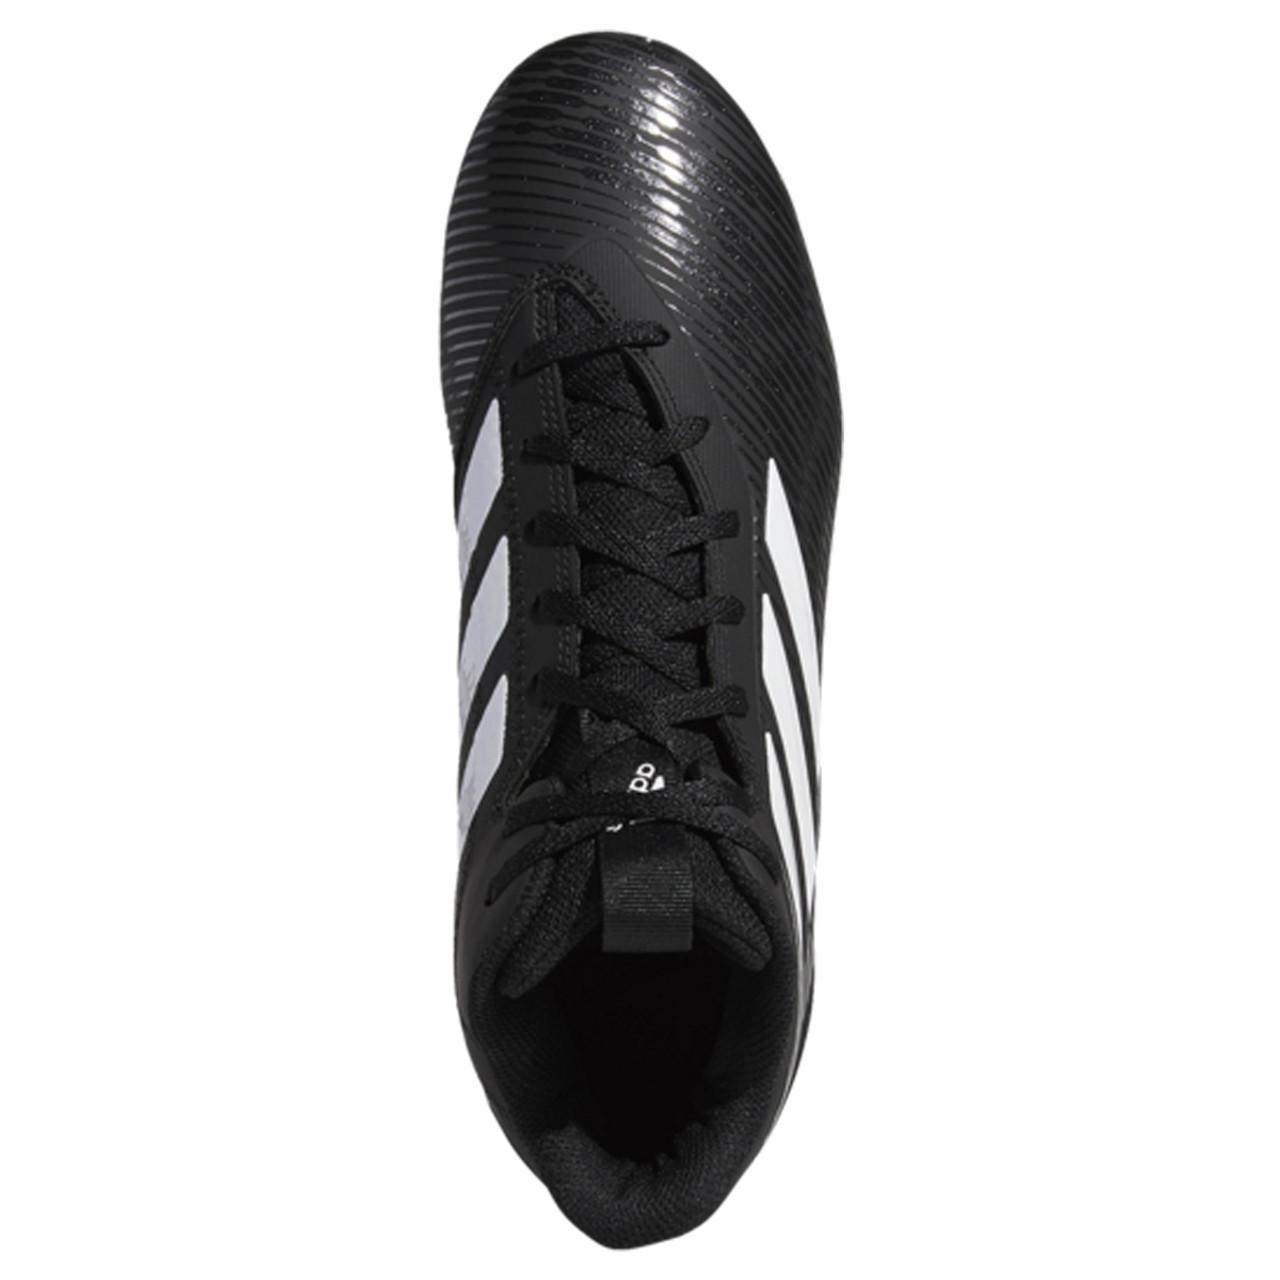 Details about Adidas Turf Hog LX Low Senior Football Cleats Size 6.5 BlackTitanium G67096